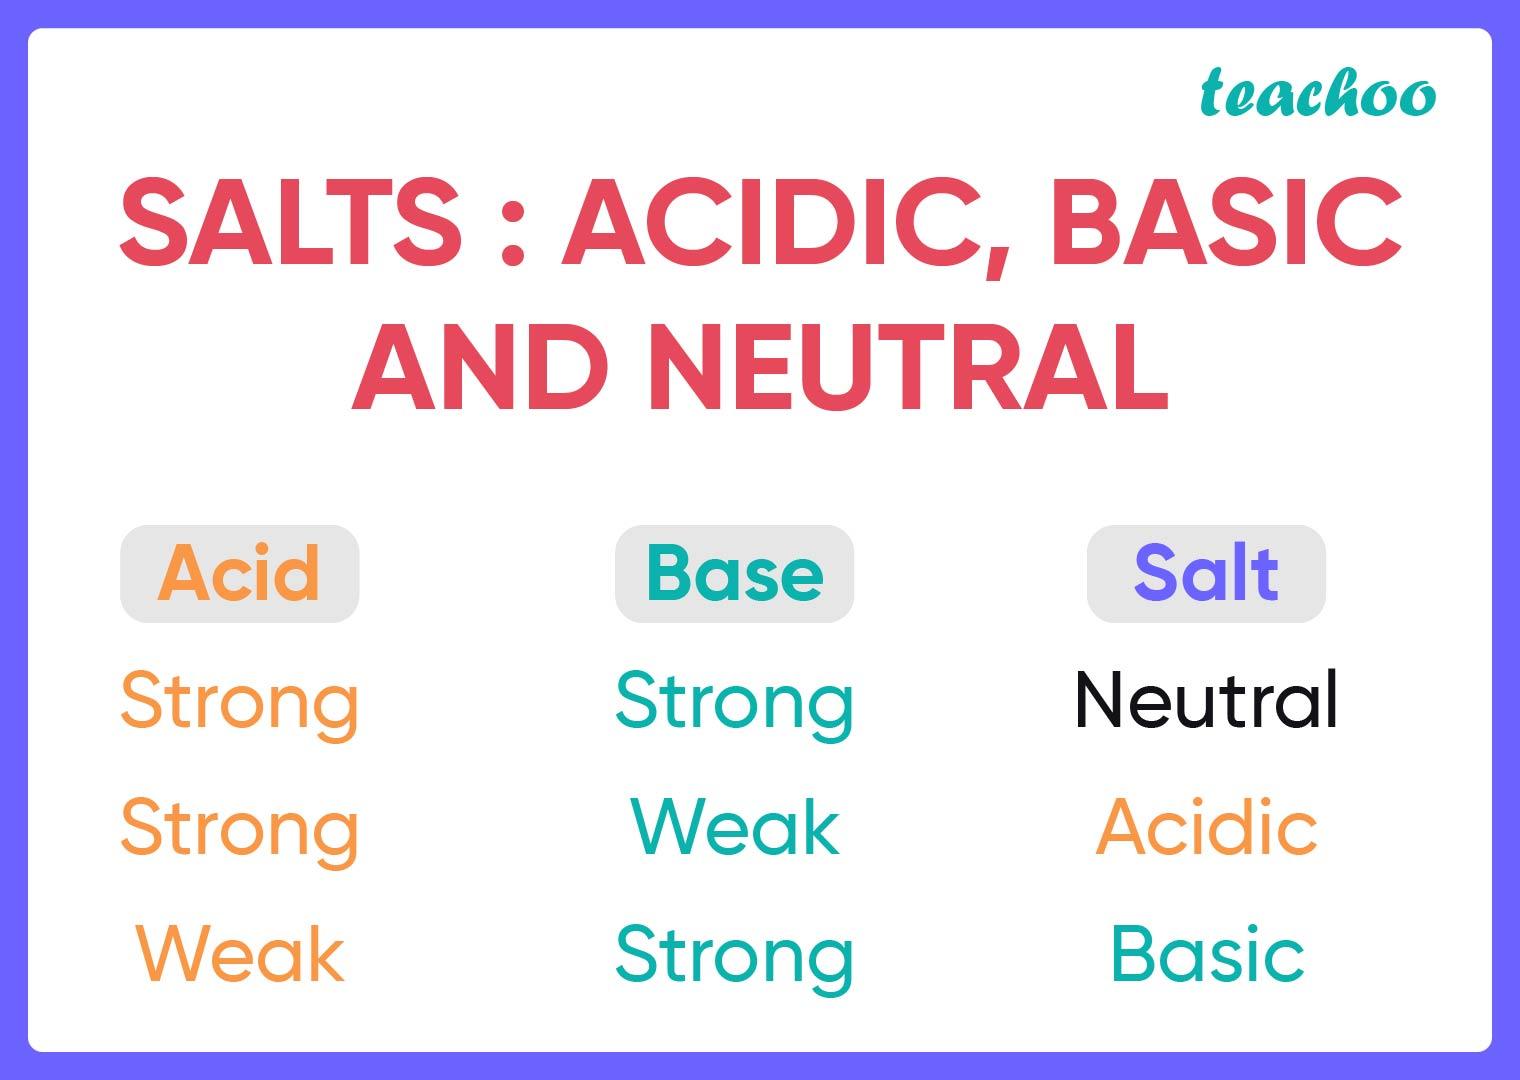 Salts - Acid, base and neutral-Teachoo.jpg